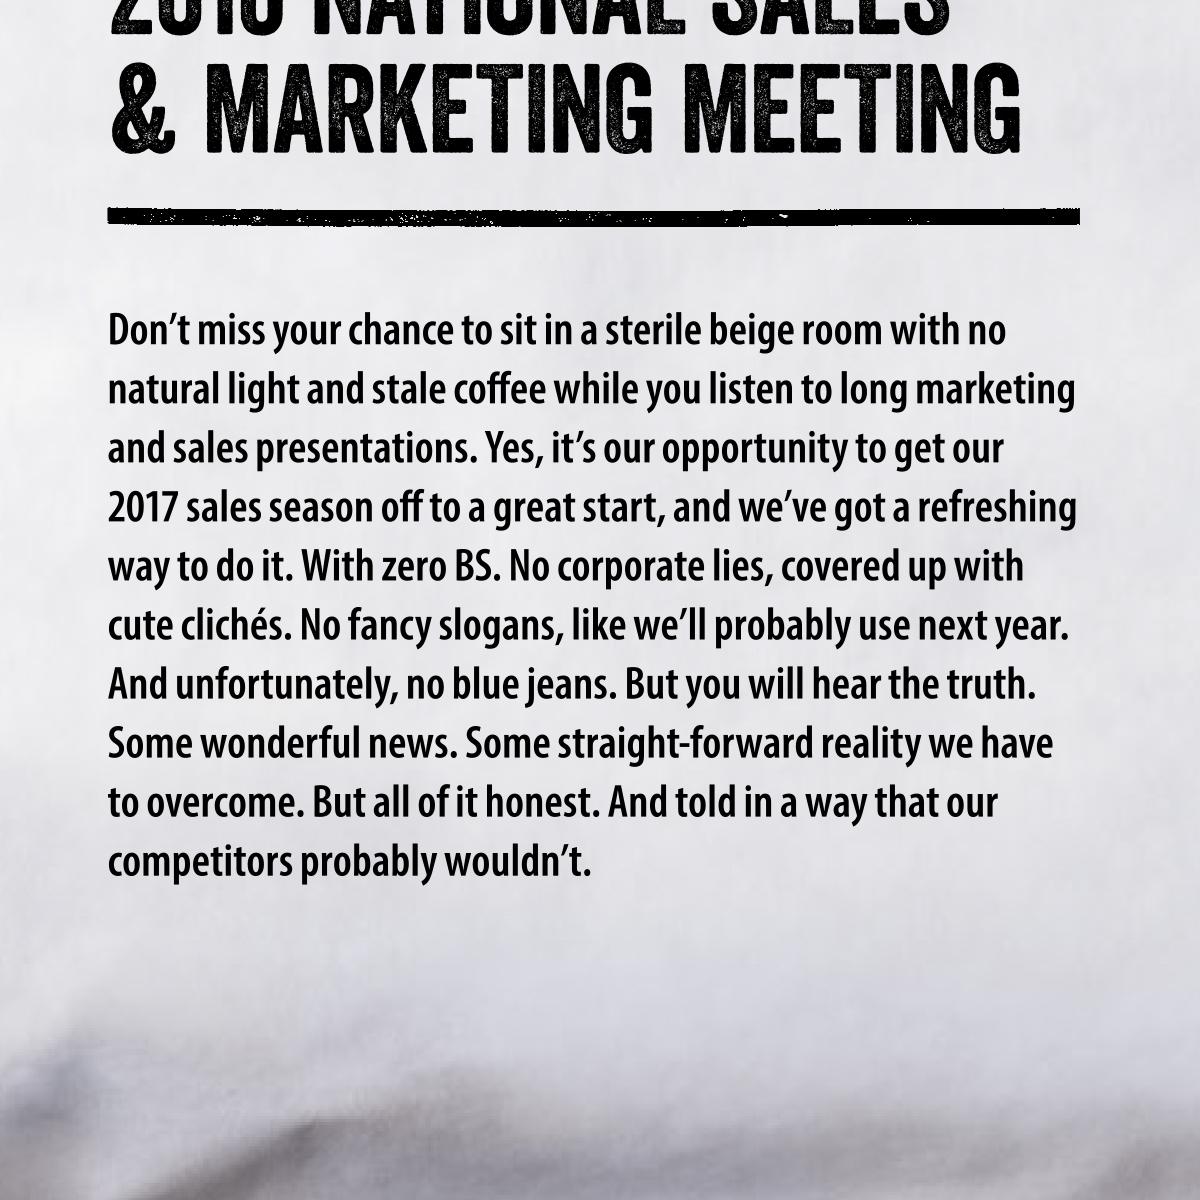 "Wyffels Hybrids ""Brutally Honest"" Sales Meeting"